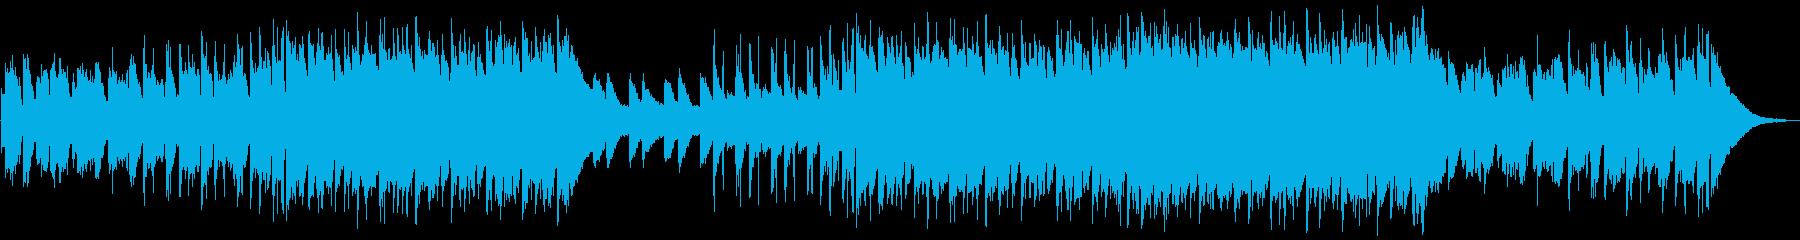 Ending / Gentle Future Pop's reproduced waveform